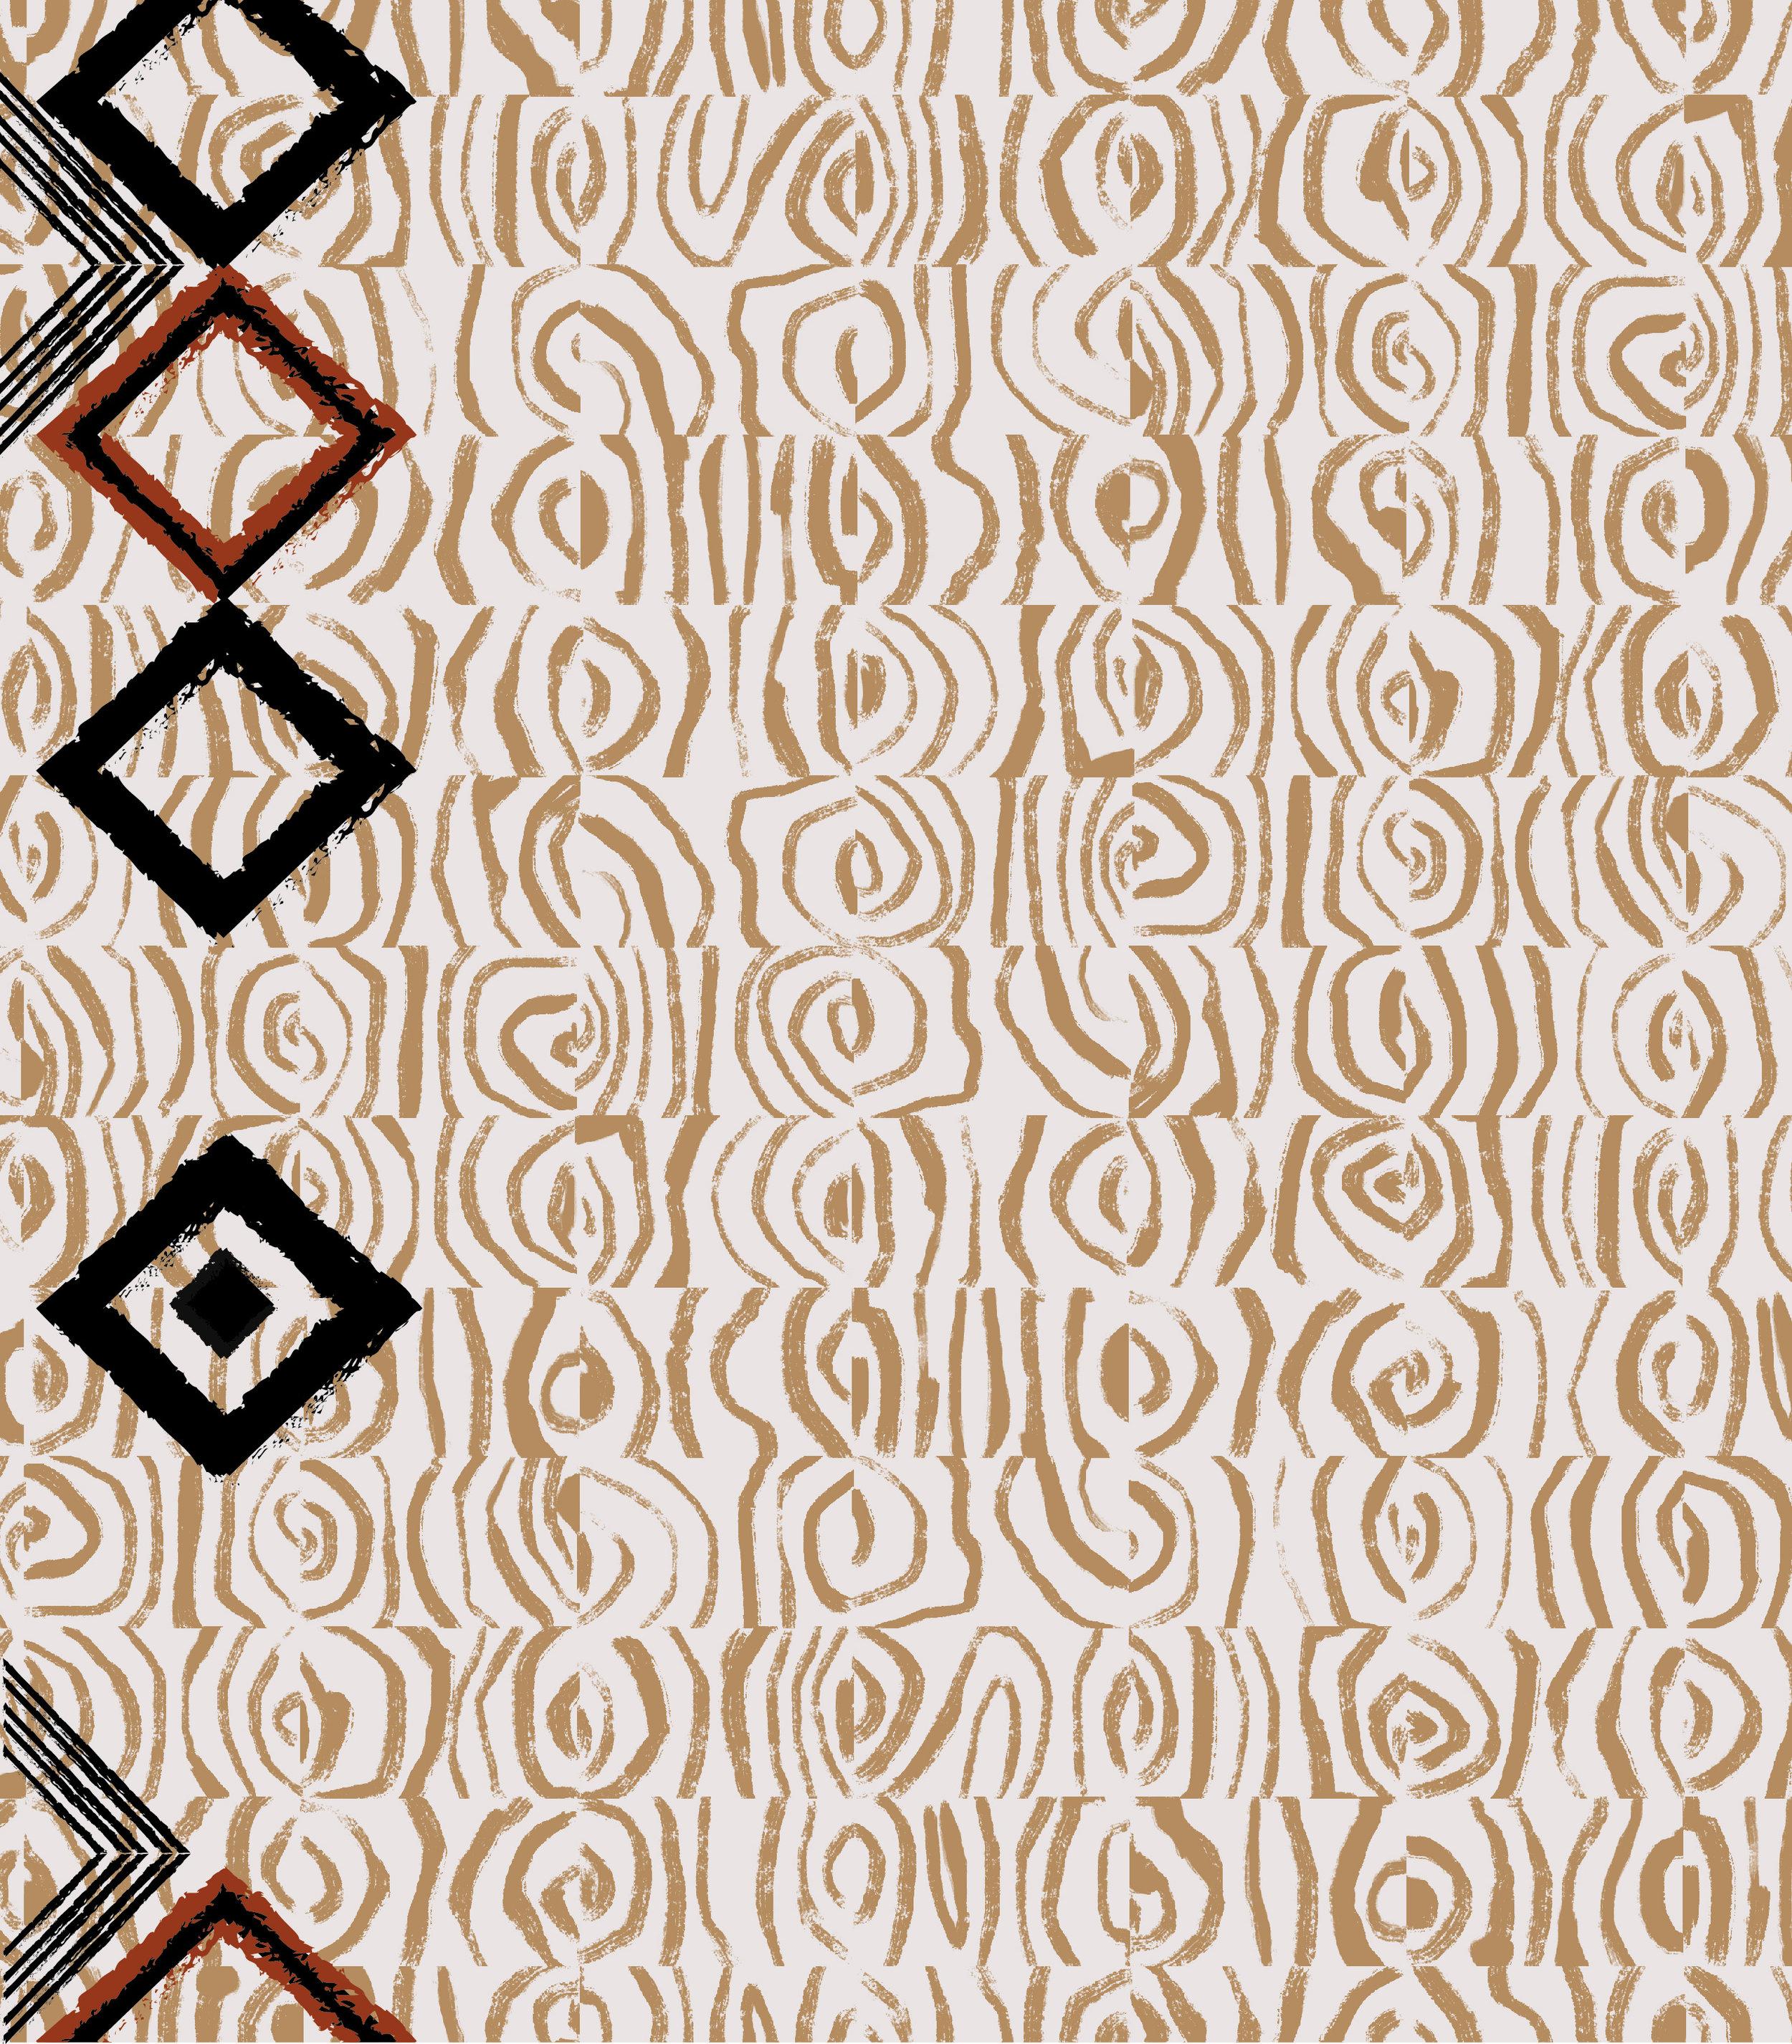 binder_design-02.jpg